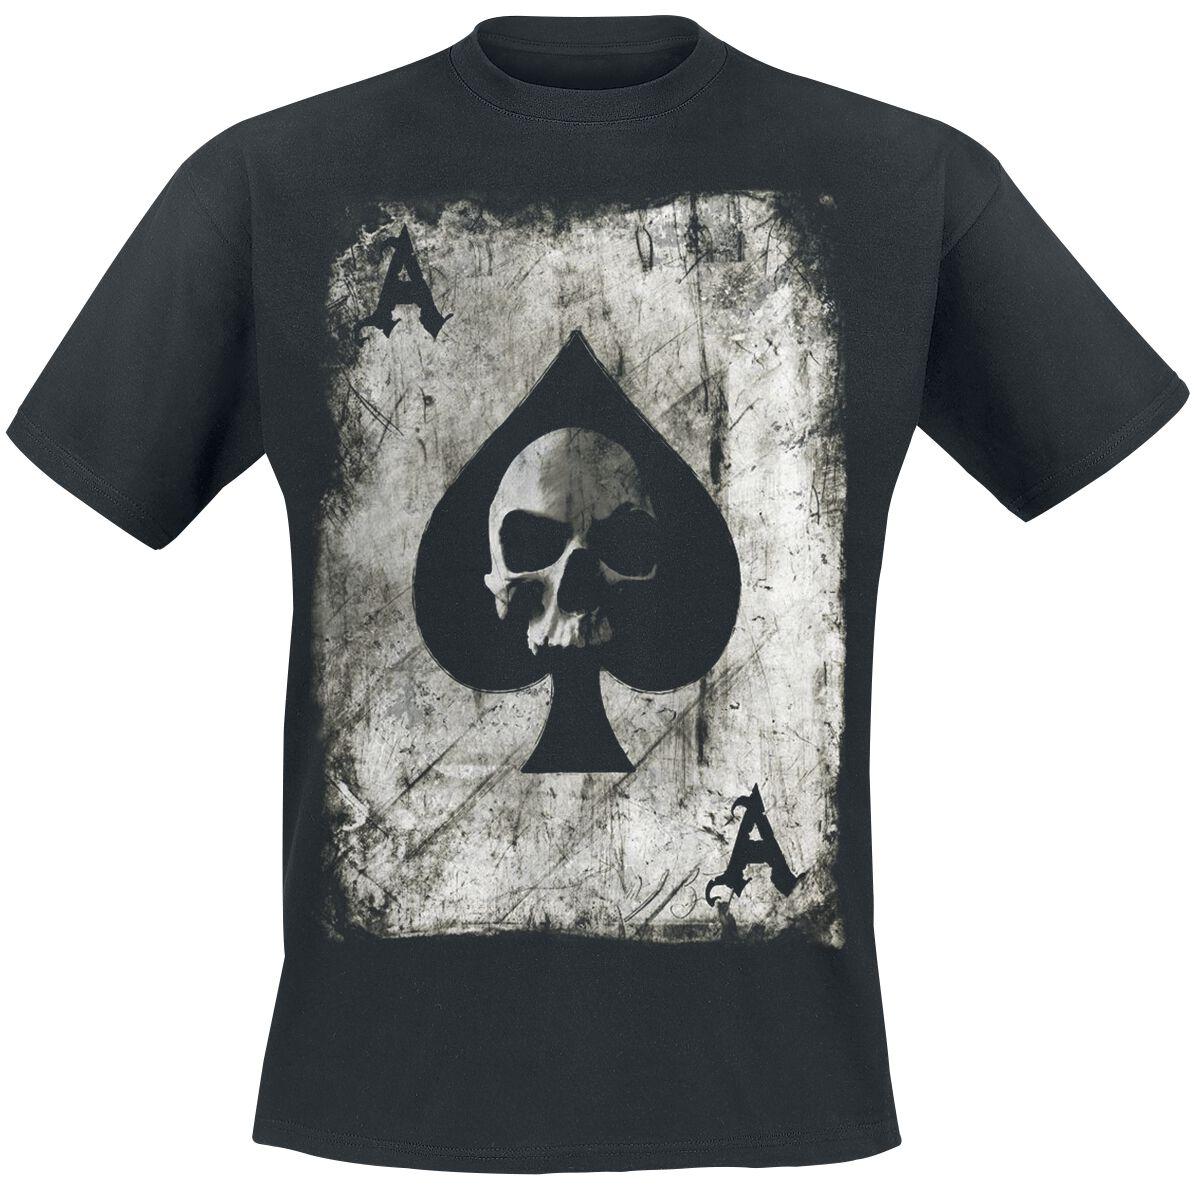 f662bf0f49d3 Pik Ace Skullcard T-shirt | EMP